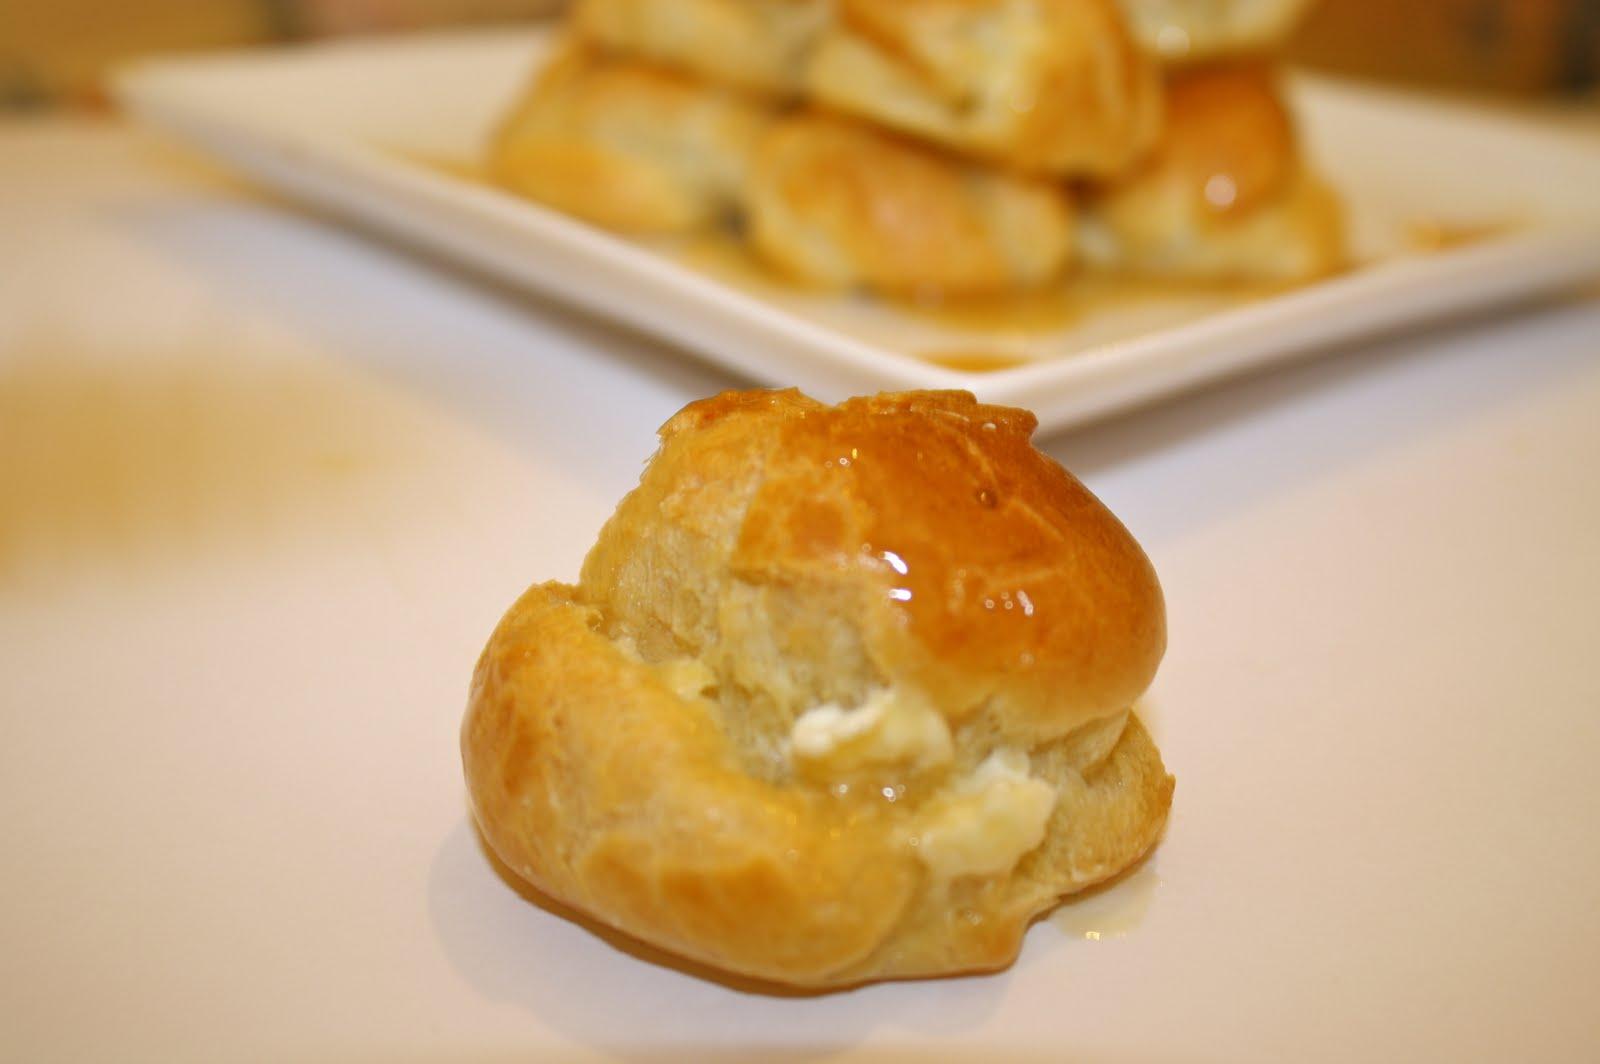 Chantilly Cream Sauce